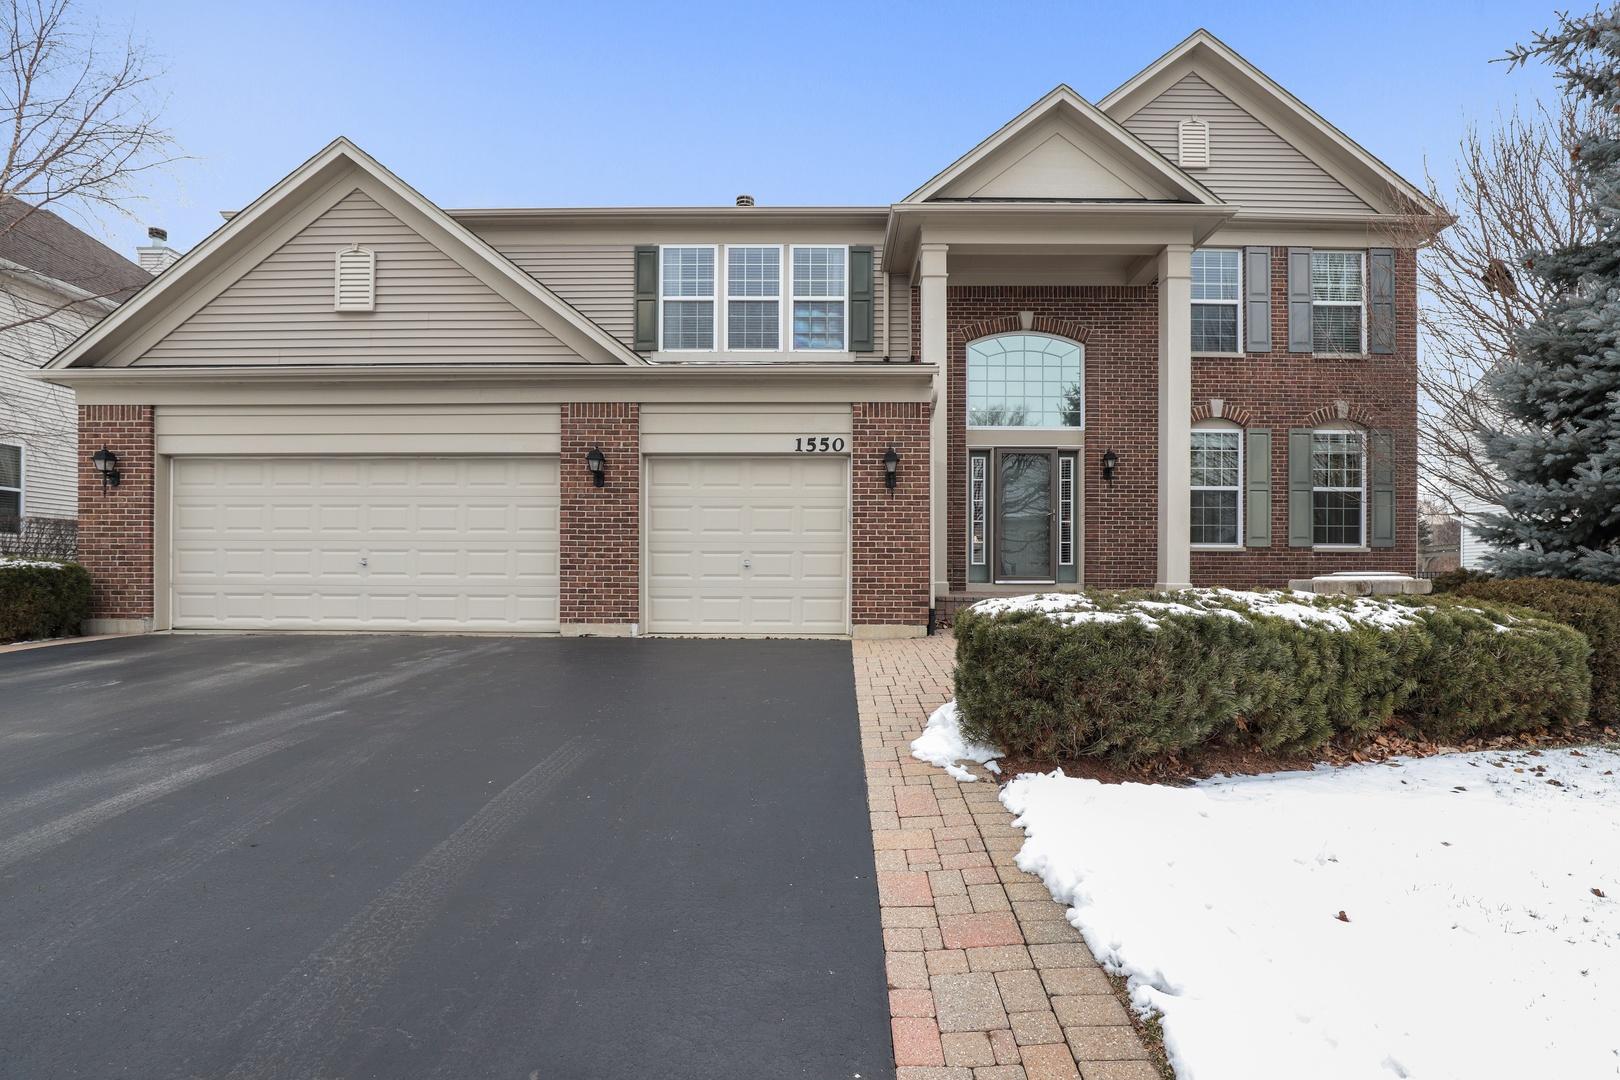 1550 Mcclellan Drive, Lindenhurst, Illinois 60046